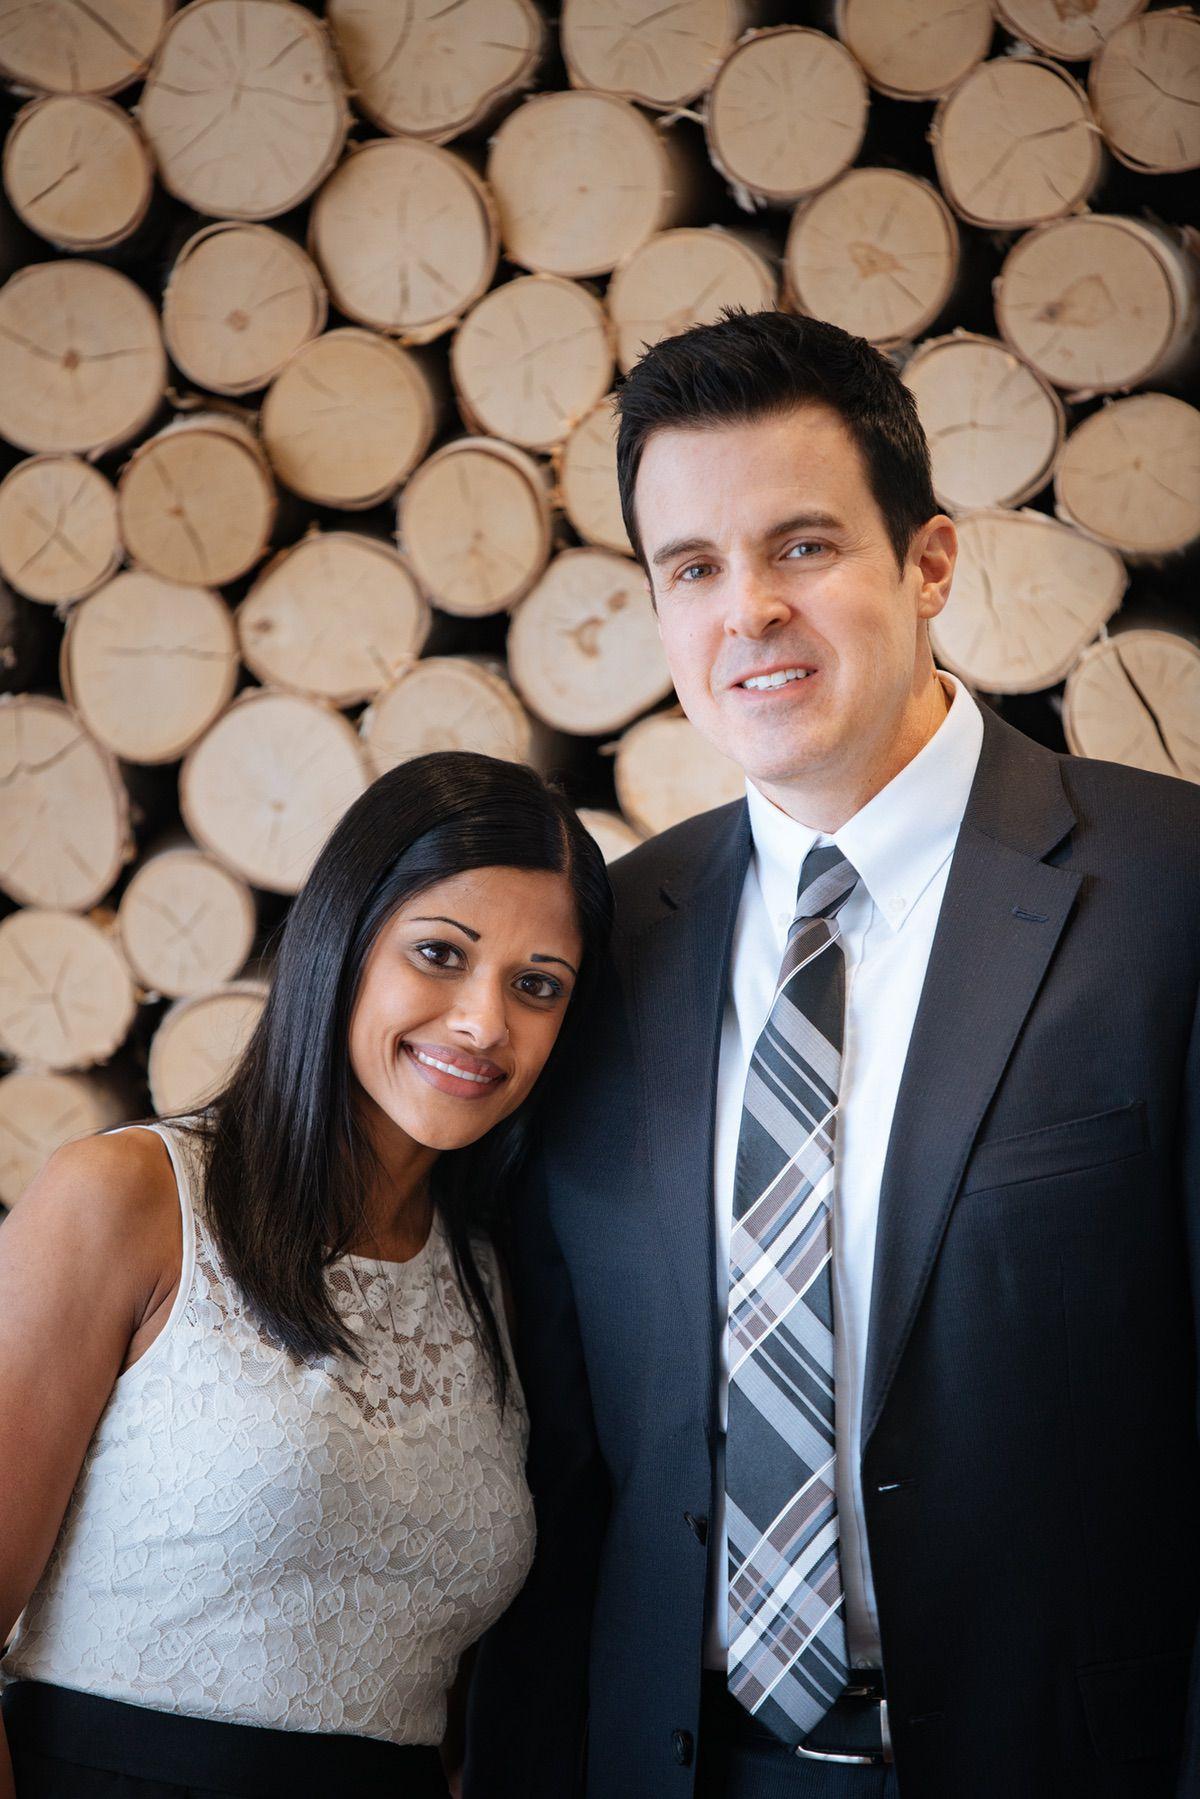 Le Cape Weddings - Binal and Jason - Engagement Session 00040.jpg